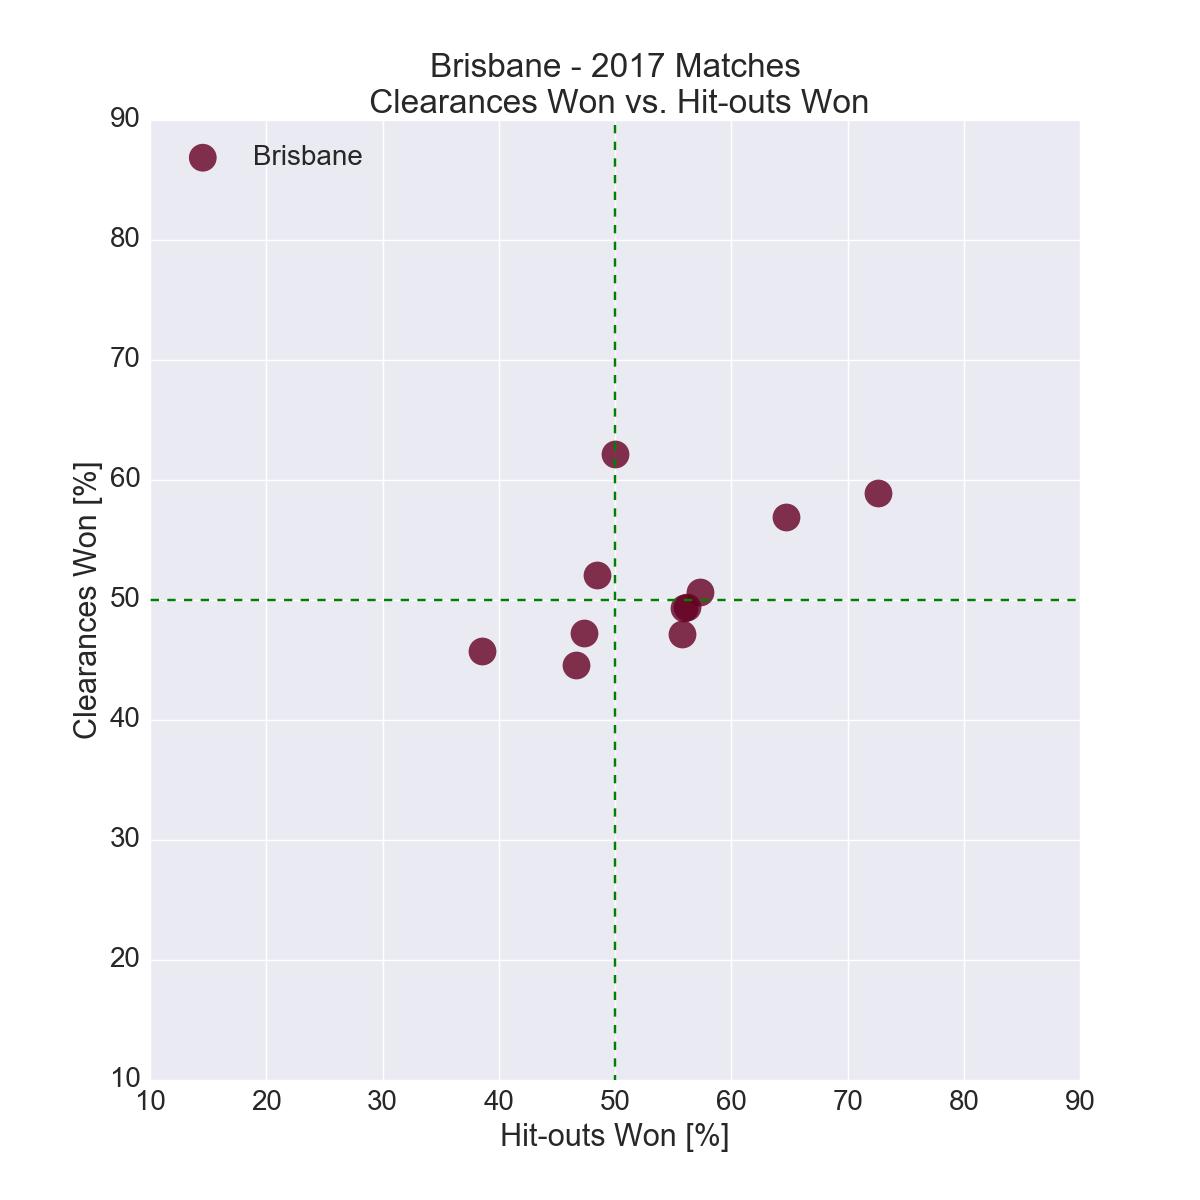 Figure-5: Brisbane in 2017 – Clearances Won vs. Hit-outs Won